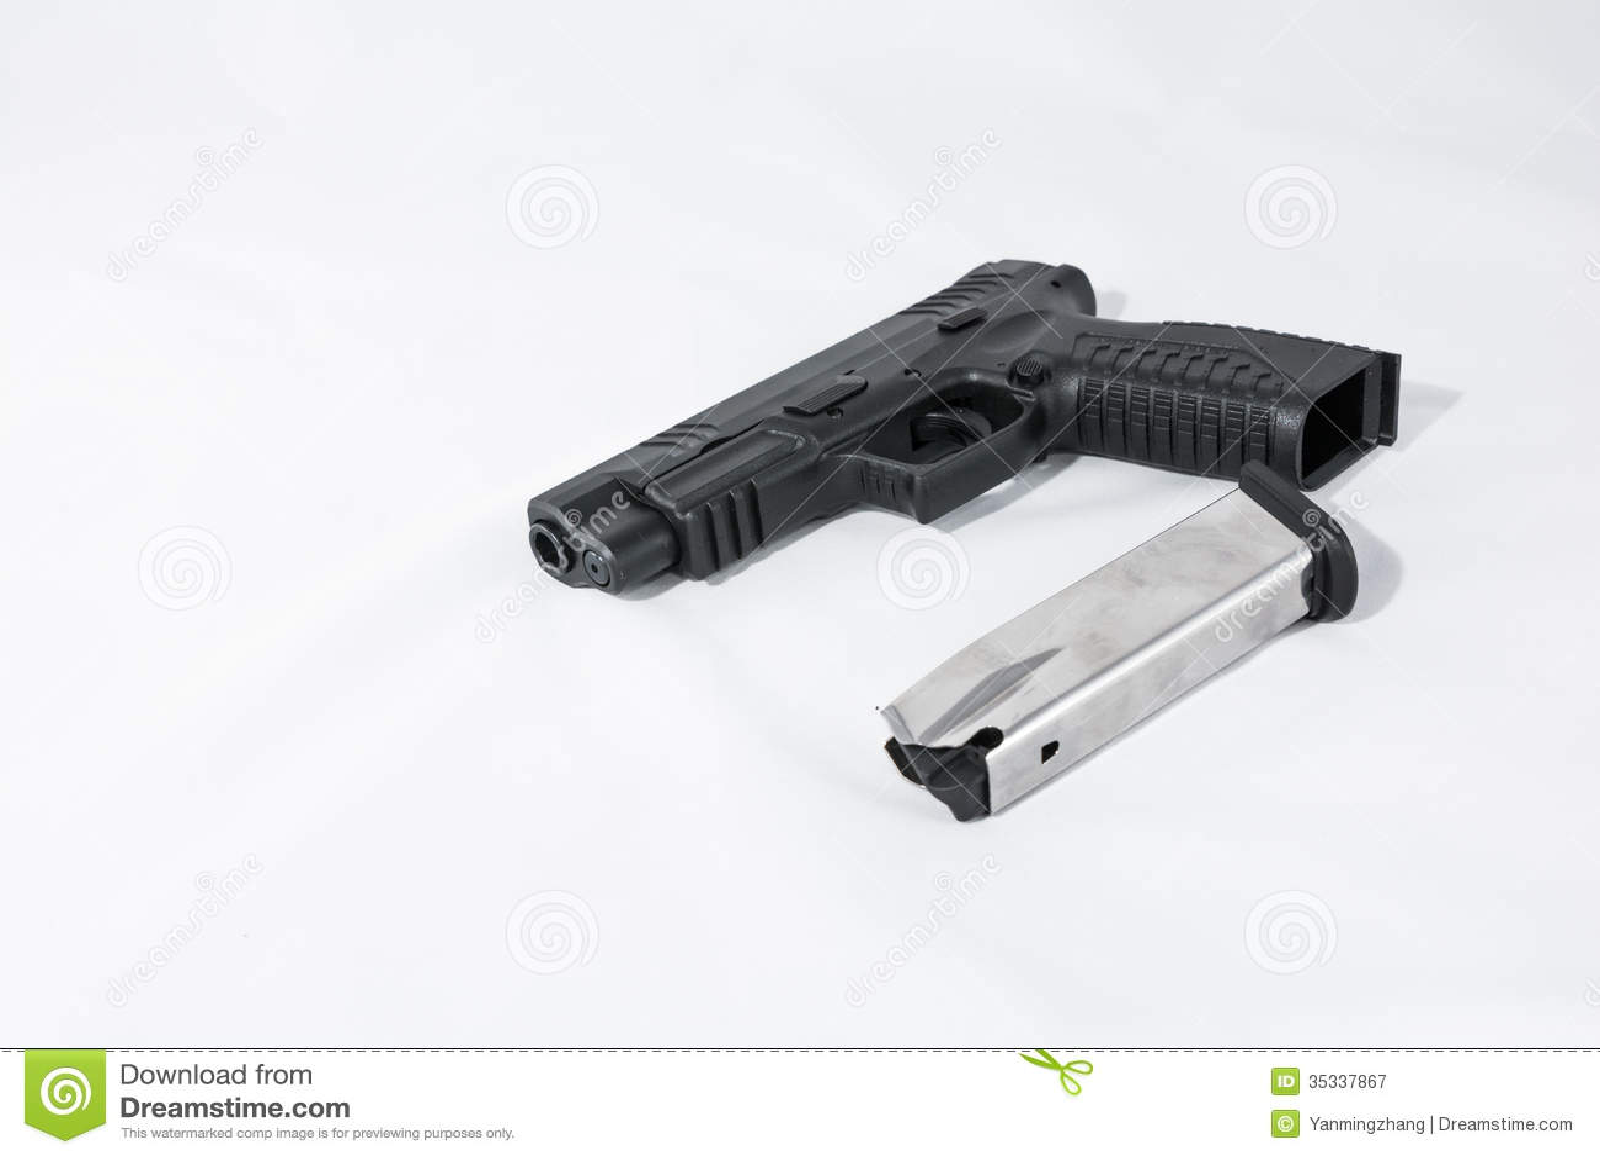 gun white background - photo #45